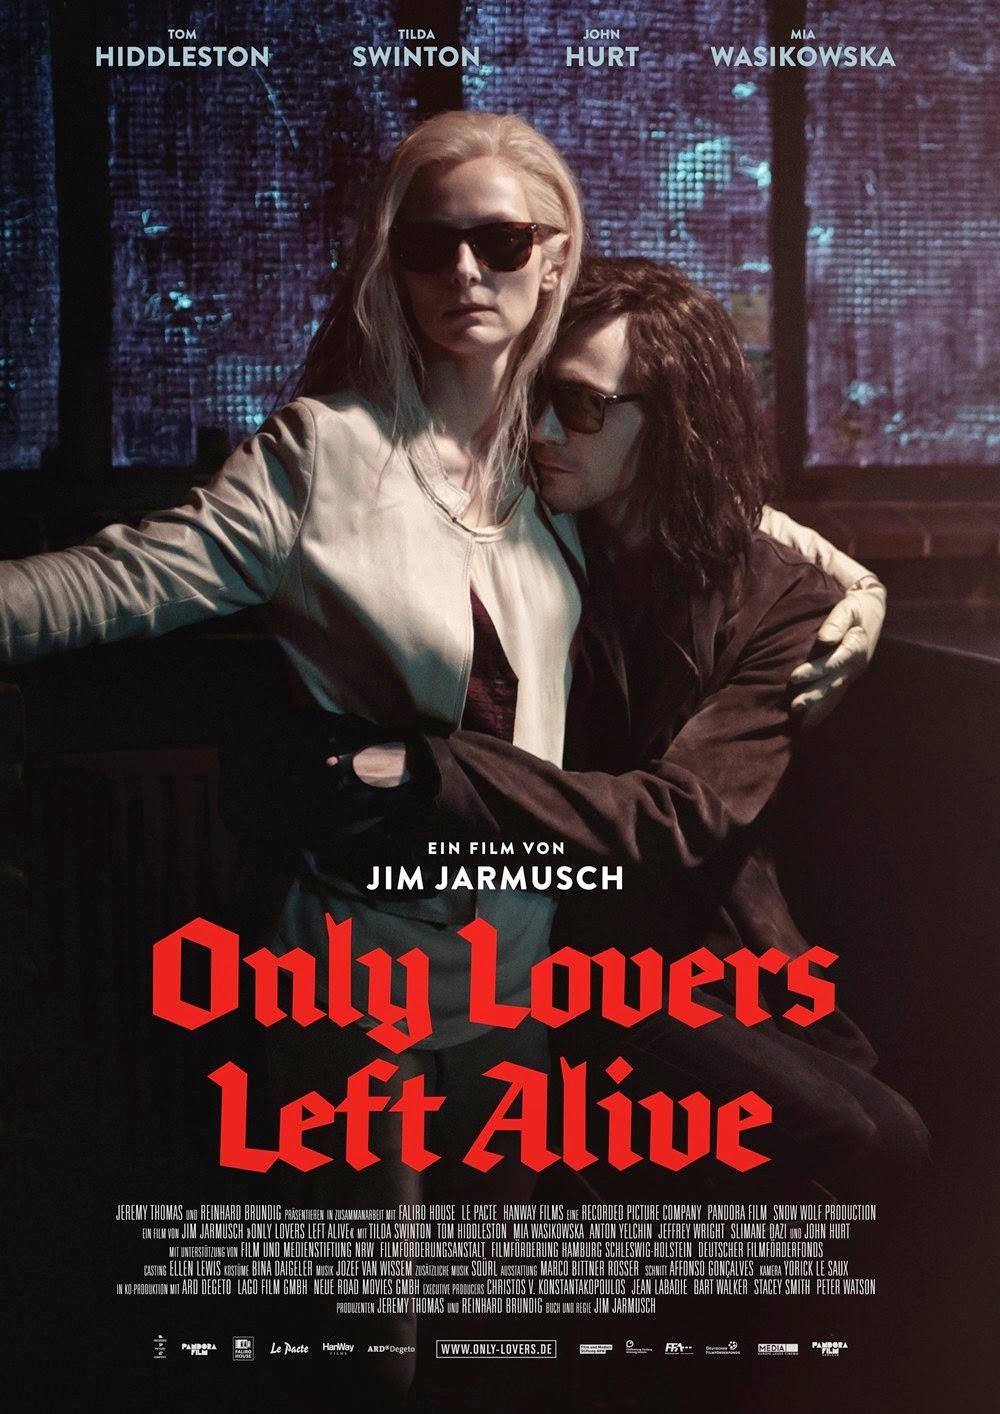 Only-Lovers-Left-Alive-Poster-03.jpg